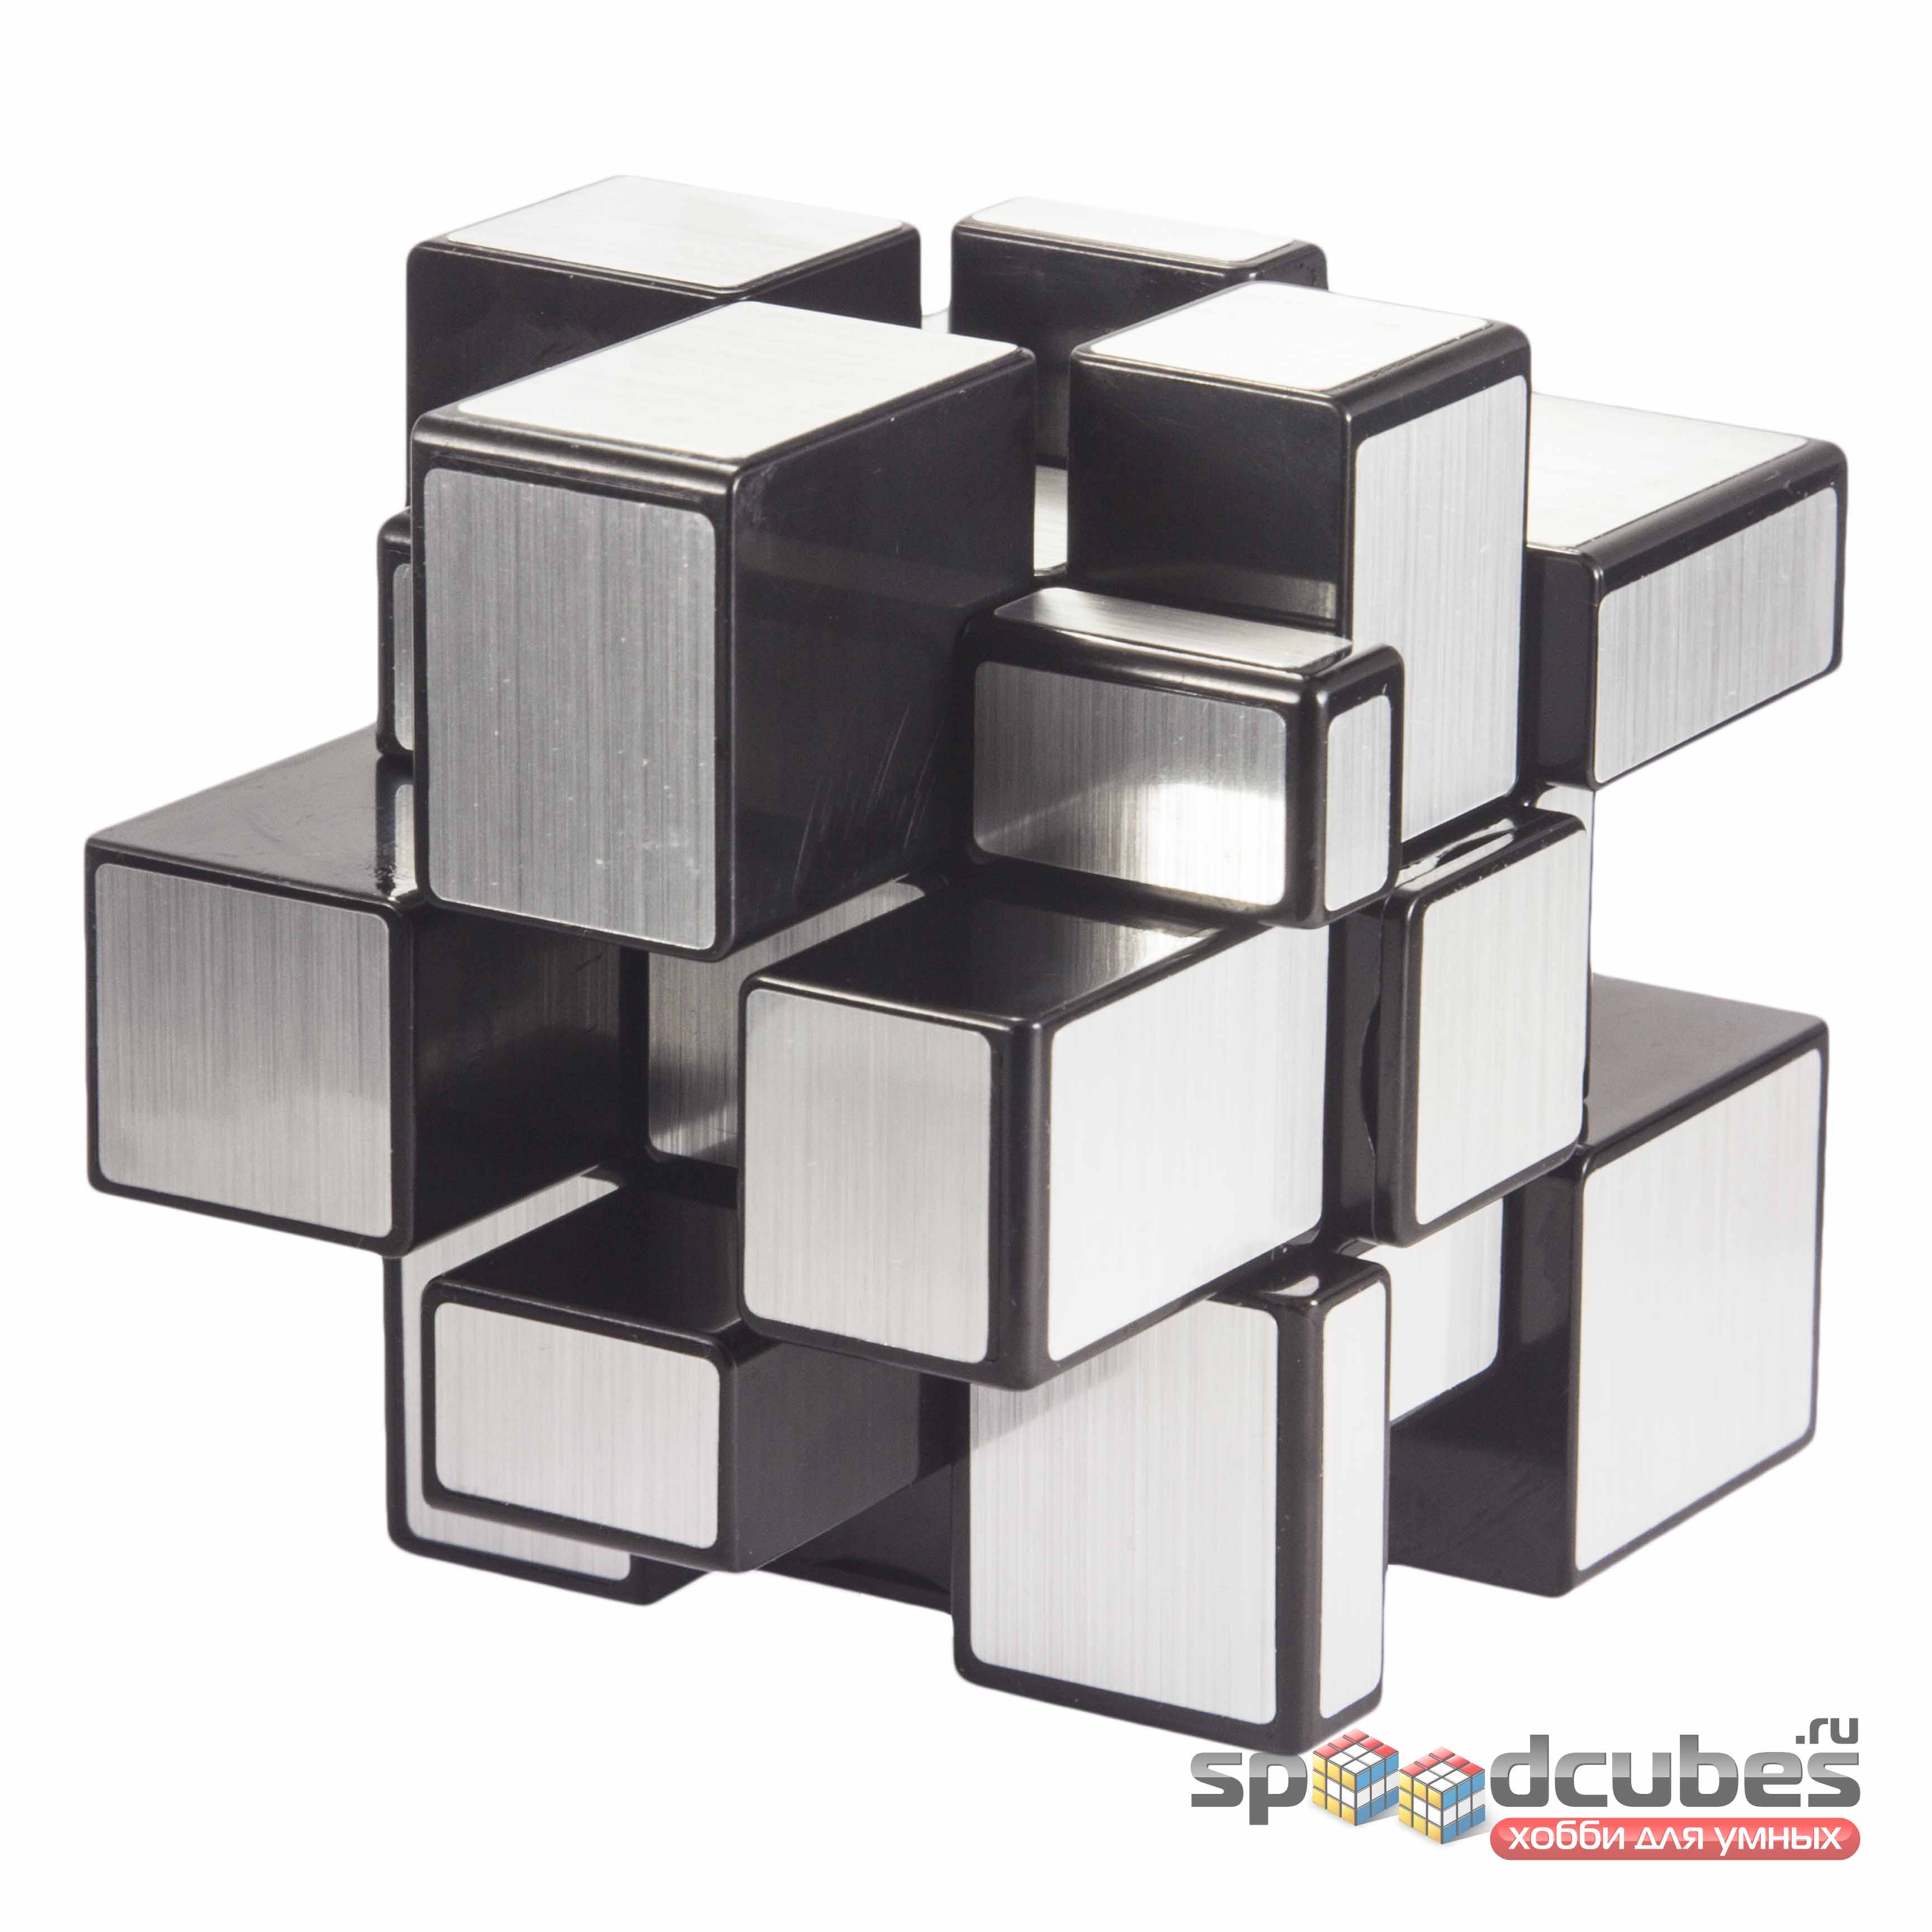 Qiyi Mofangge Mirror Cube 2